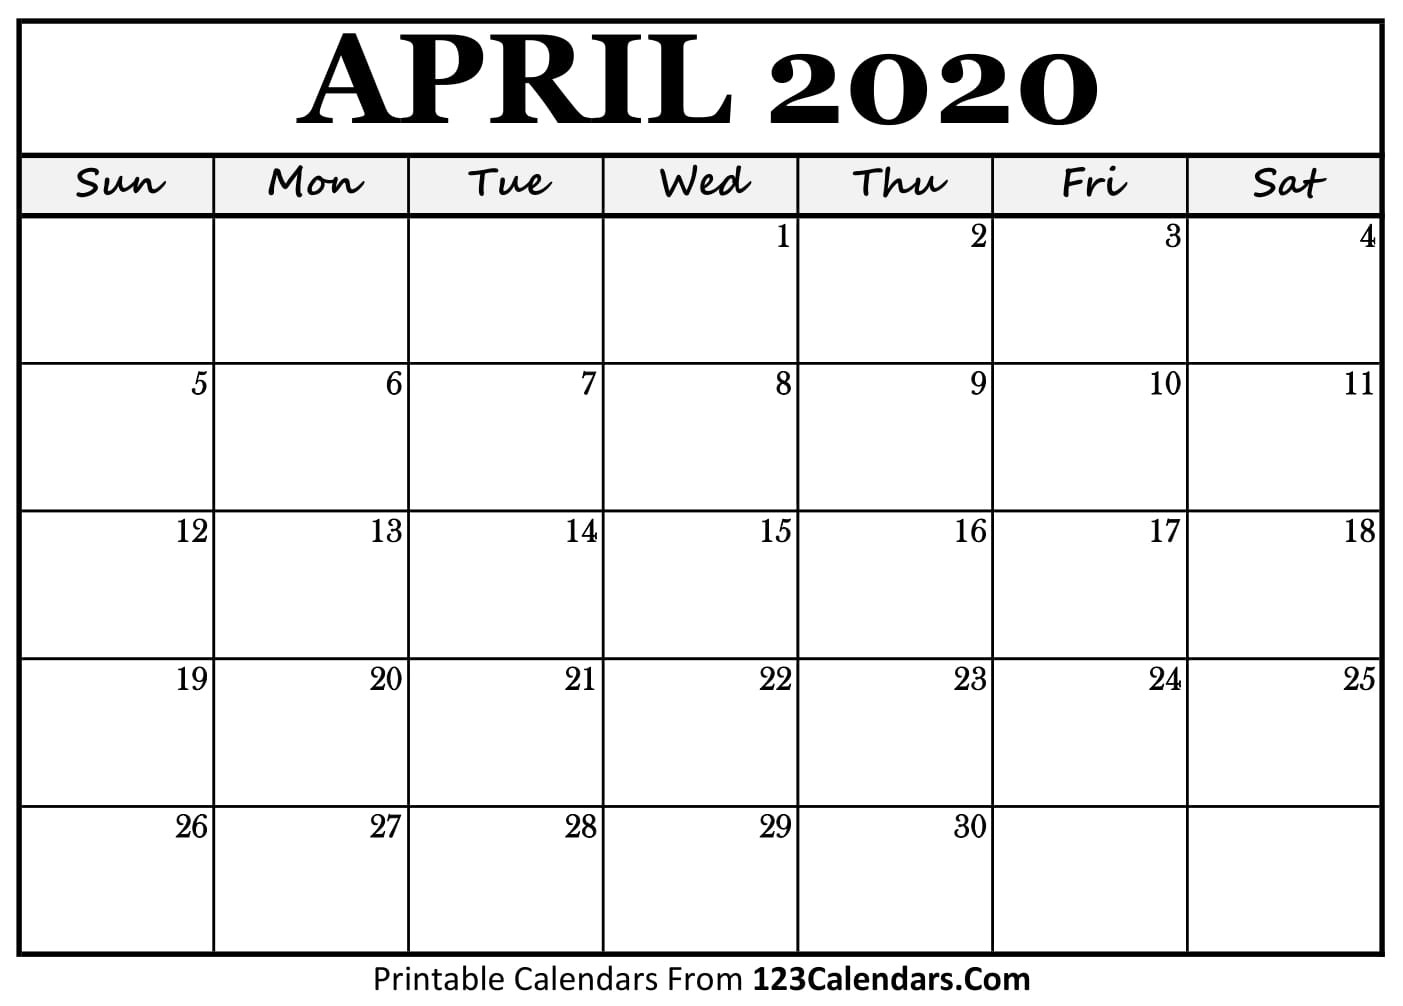 Best Templates: Print Feb 2020 Calendar-Waterproofpaper.com January 2020 Calendar